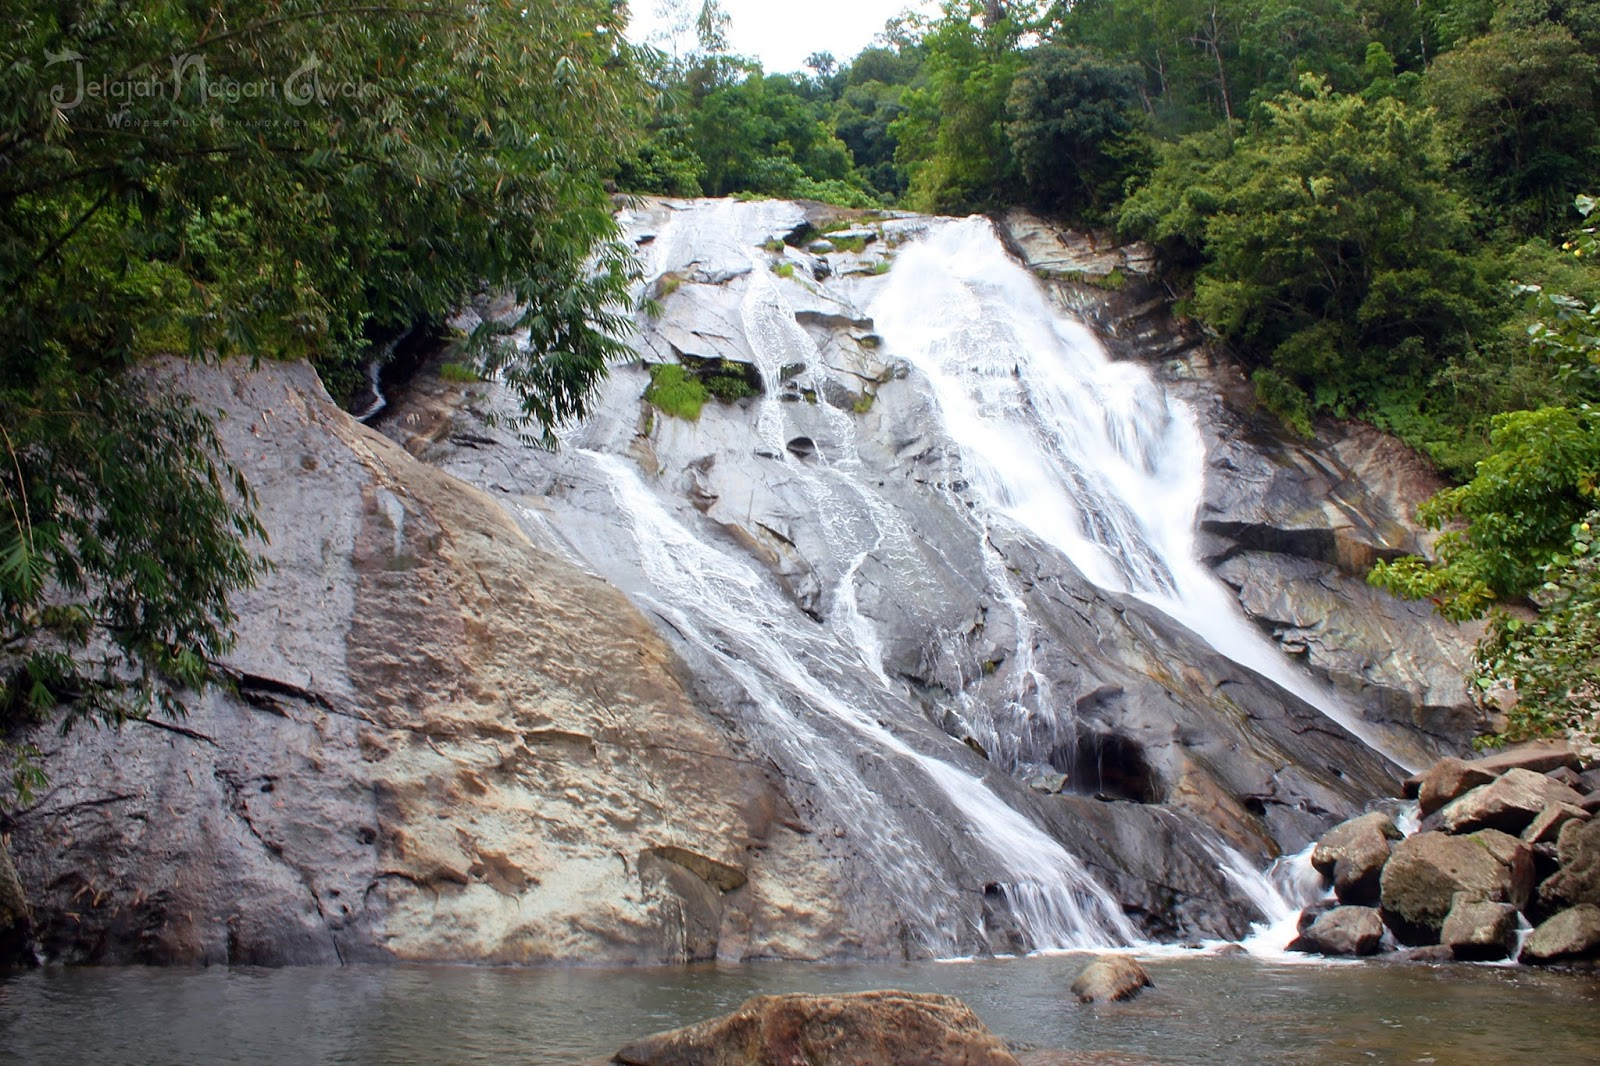 bayang sani waterfall